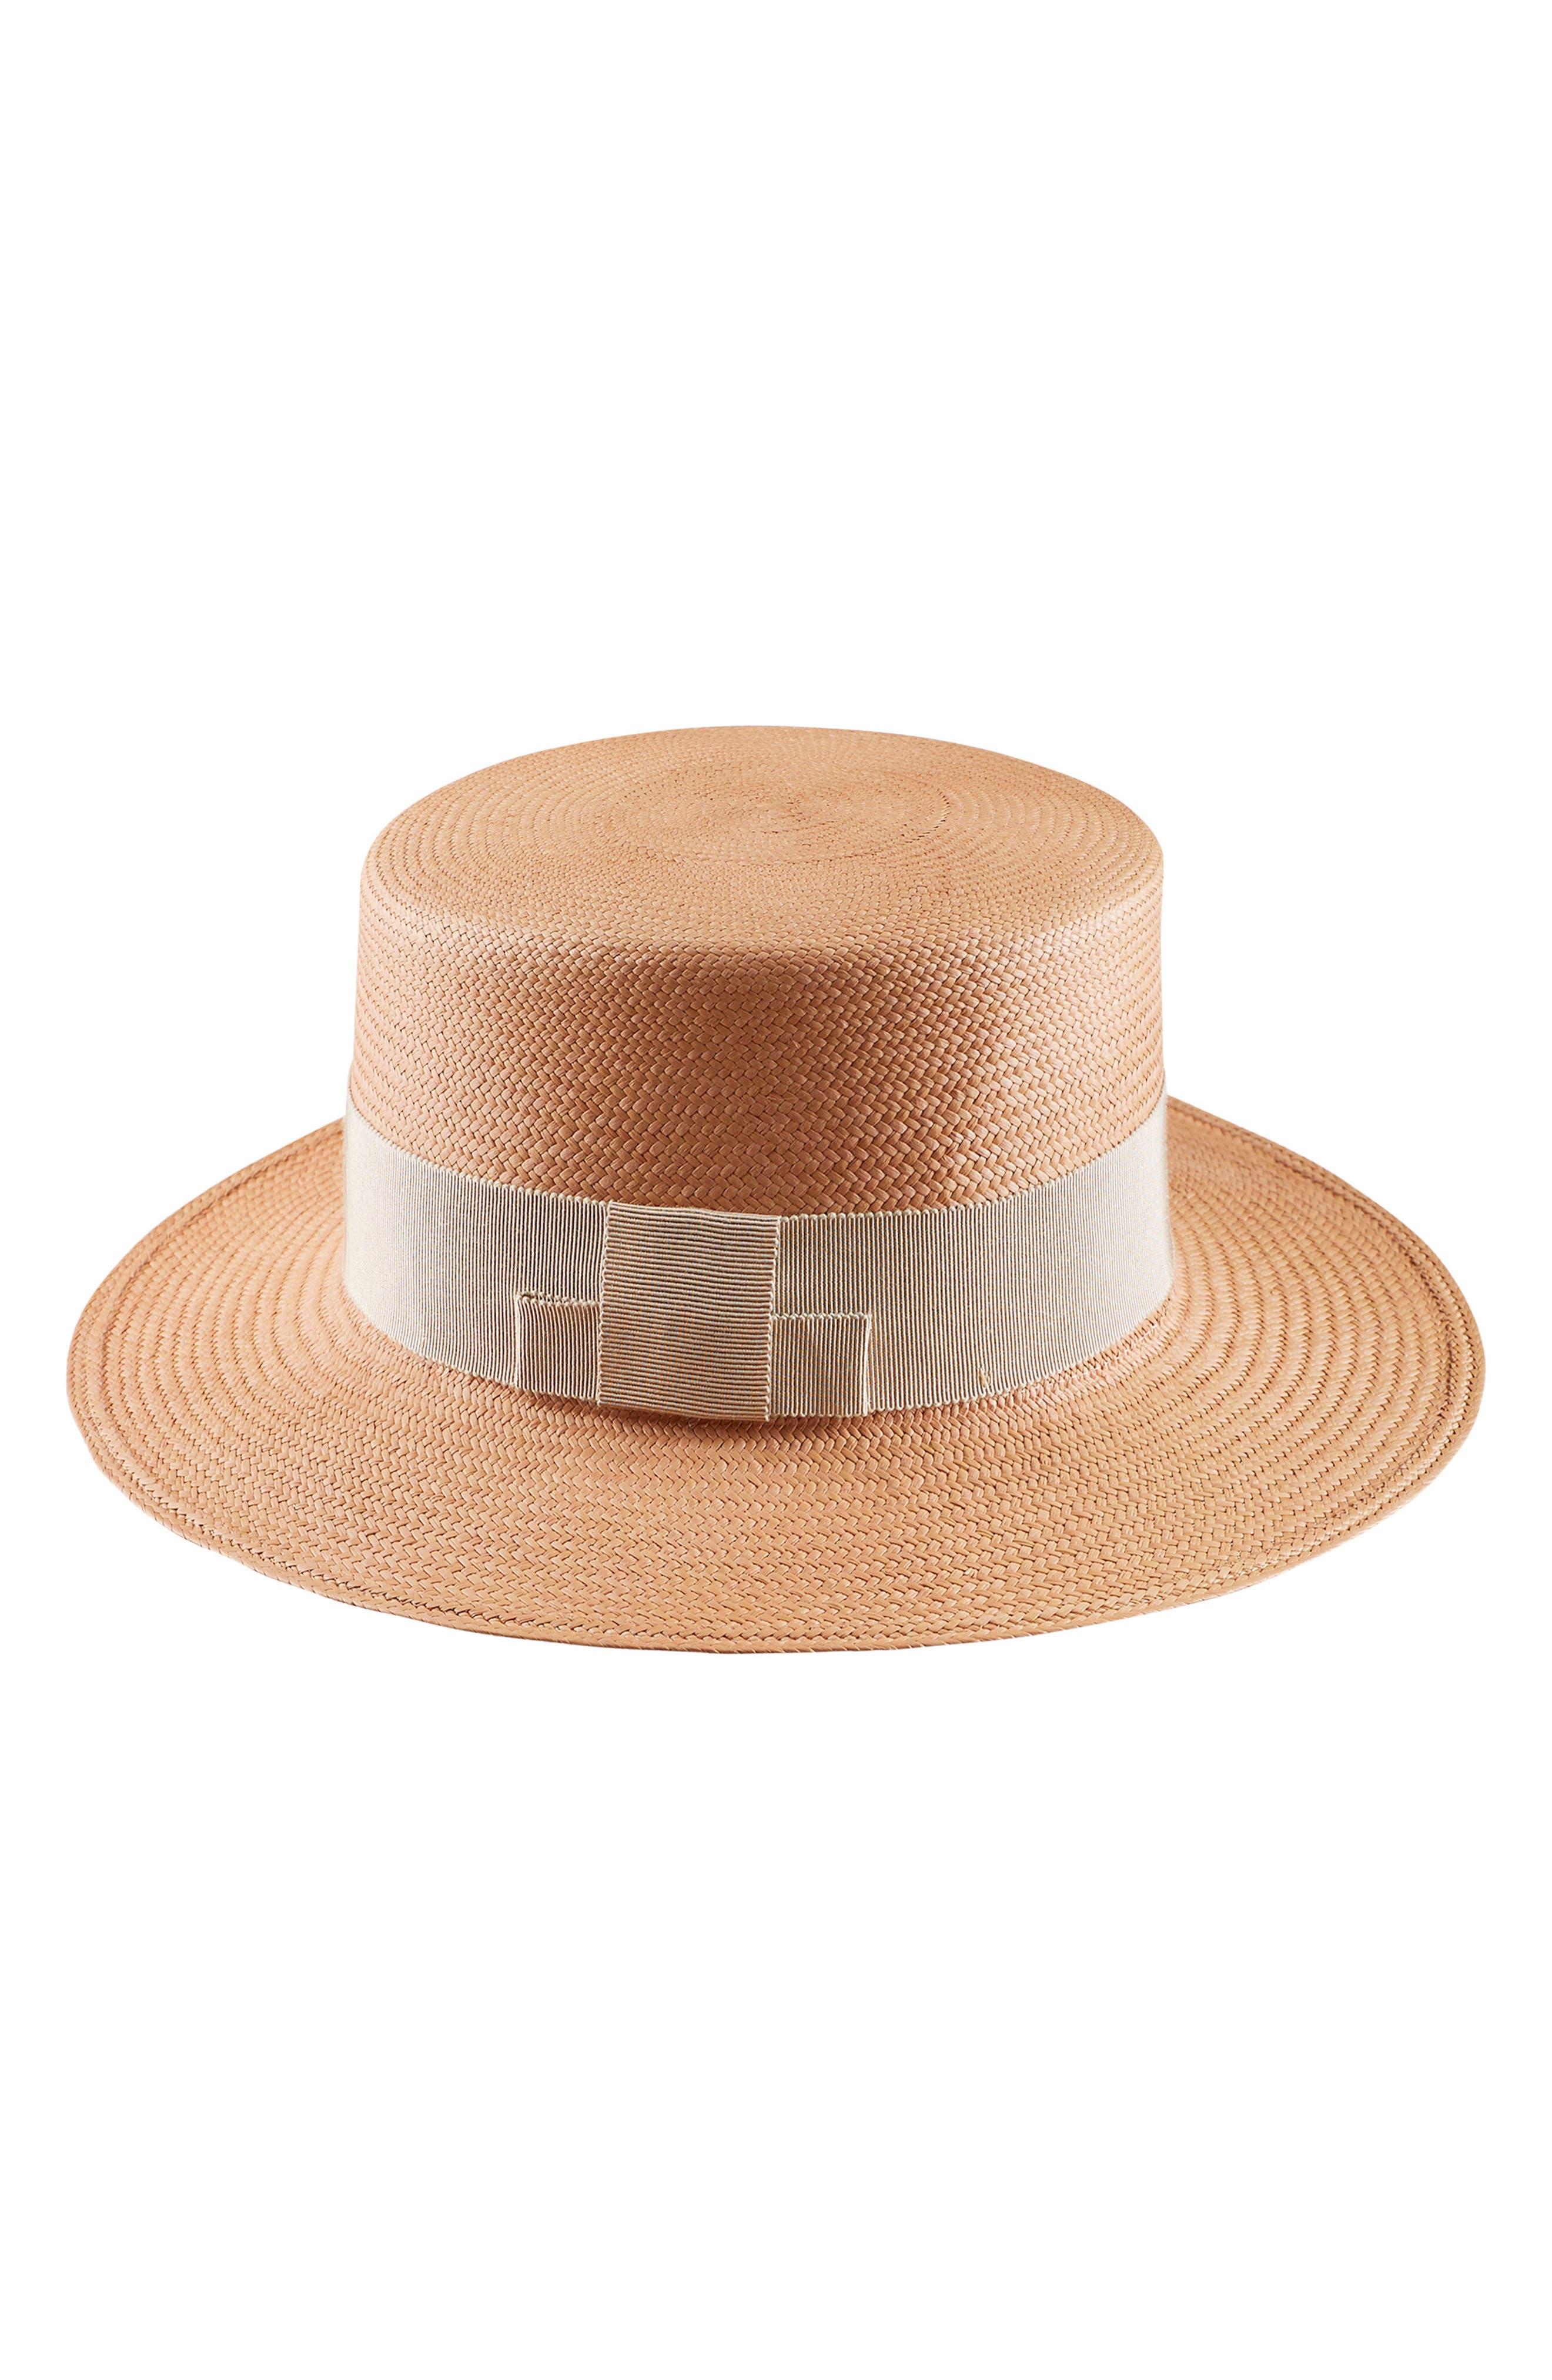 HELEN KAMINSKI WOVEN PALM PANAMA BOATER HAT - BROWN